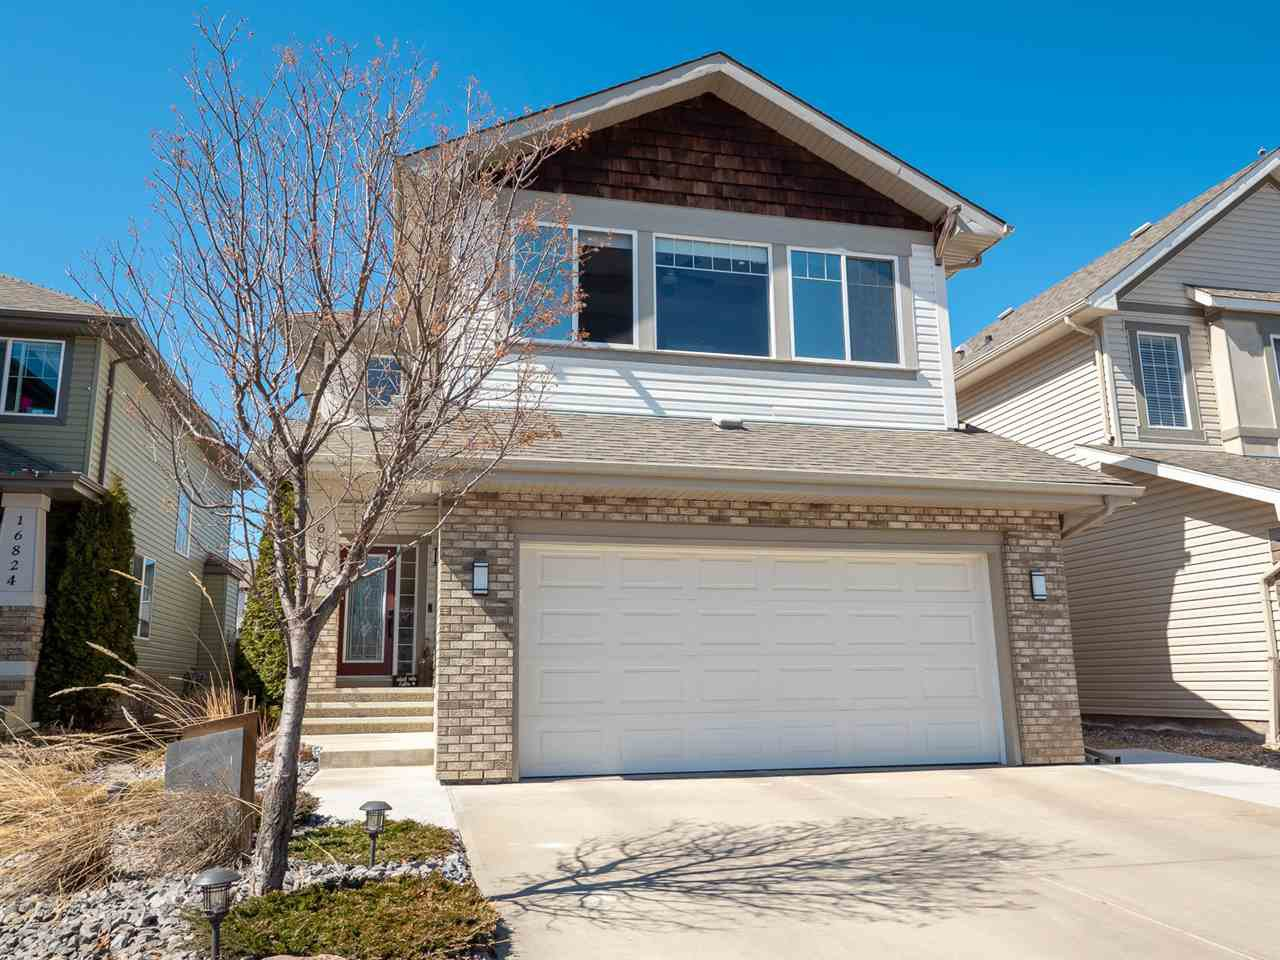 Main Photo: 16904 57 Street in Edmonton: Zone 03 House for sale : MLS®# E4197897